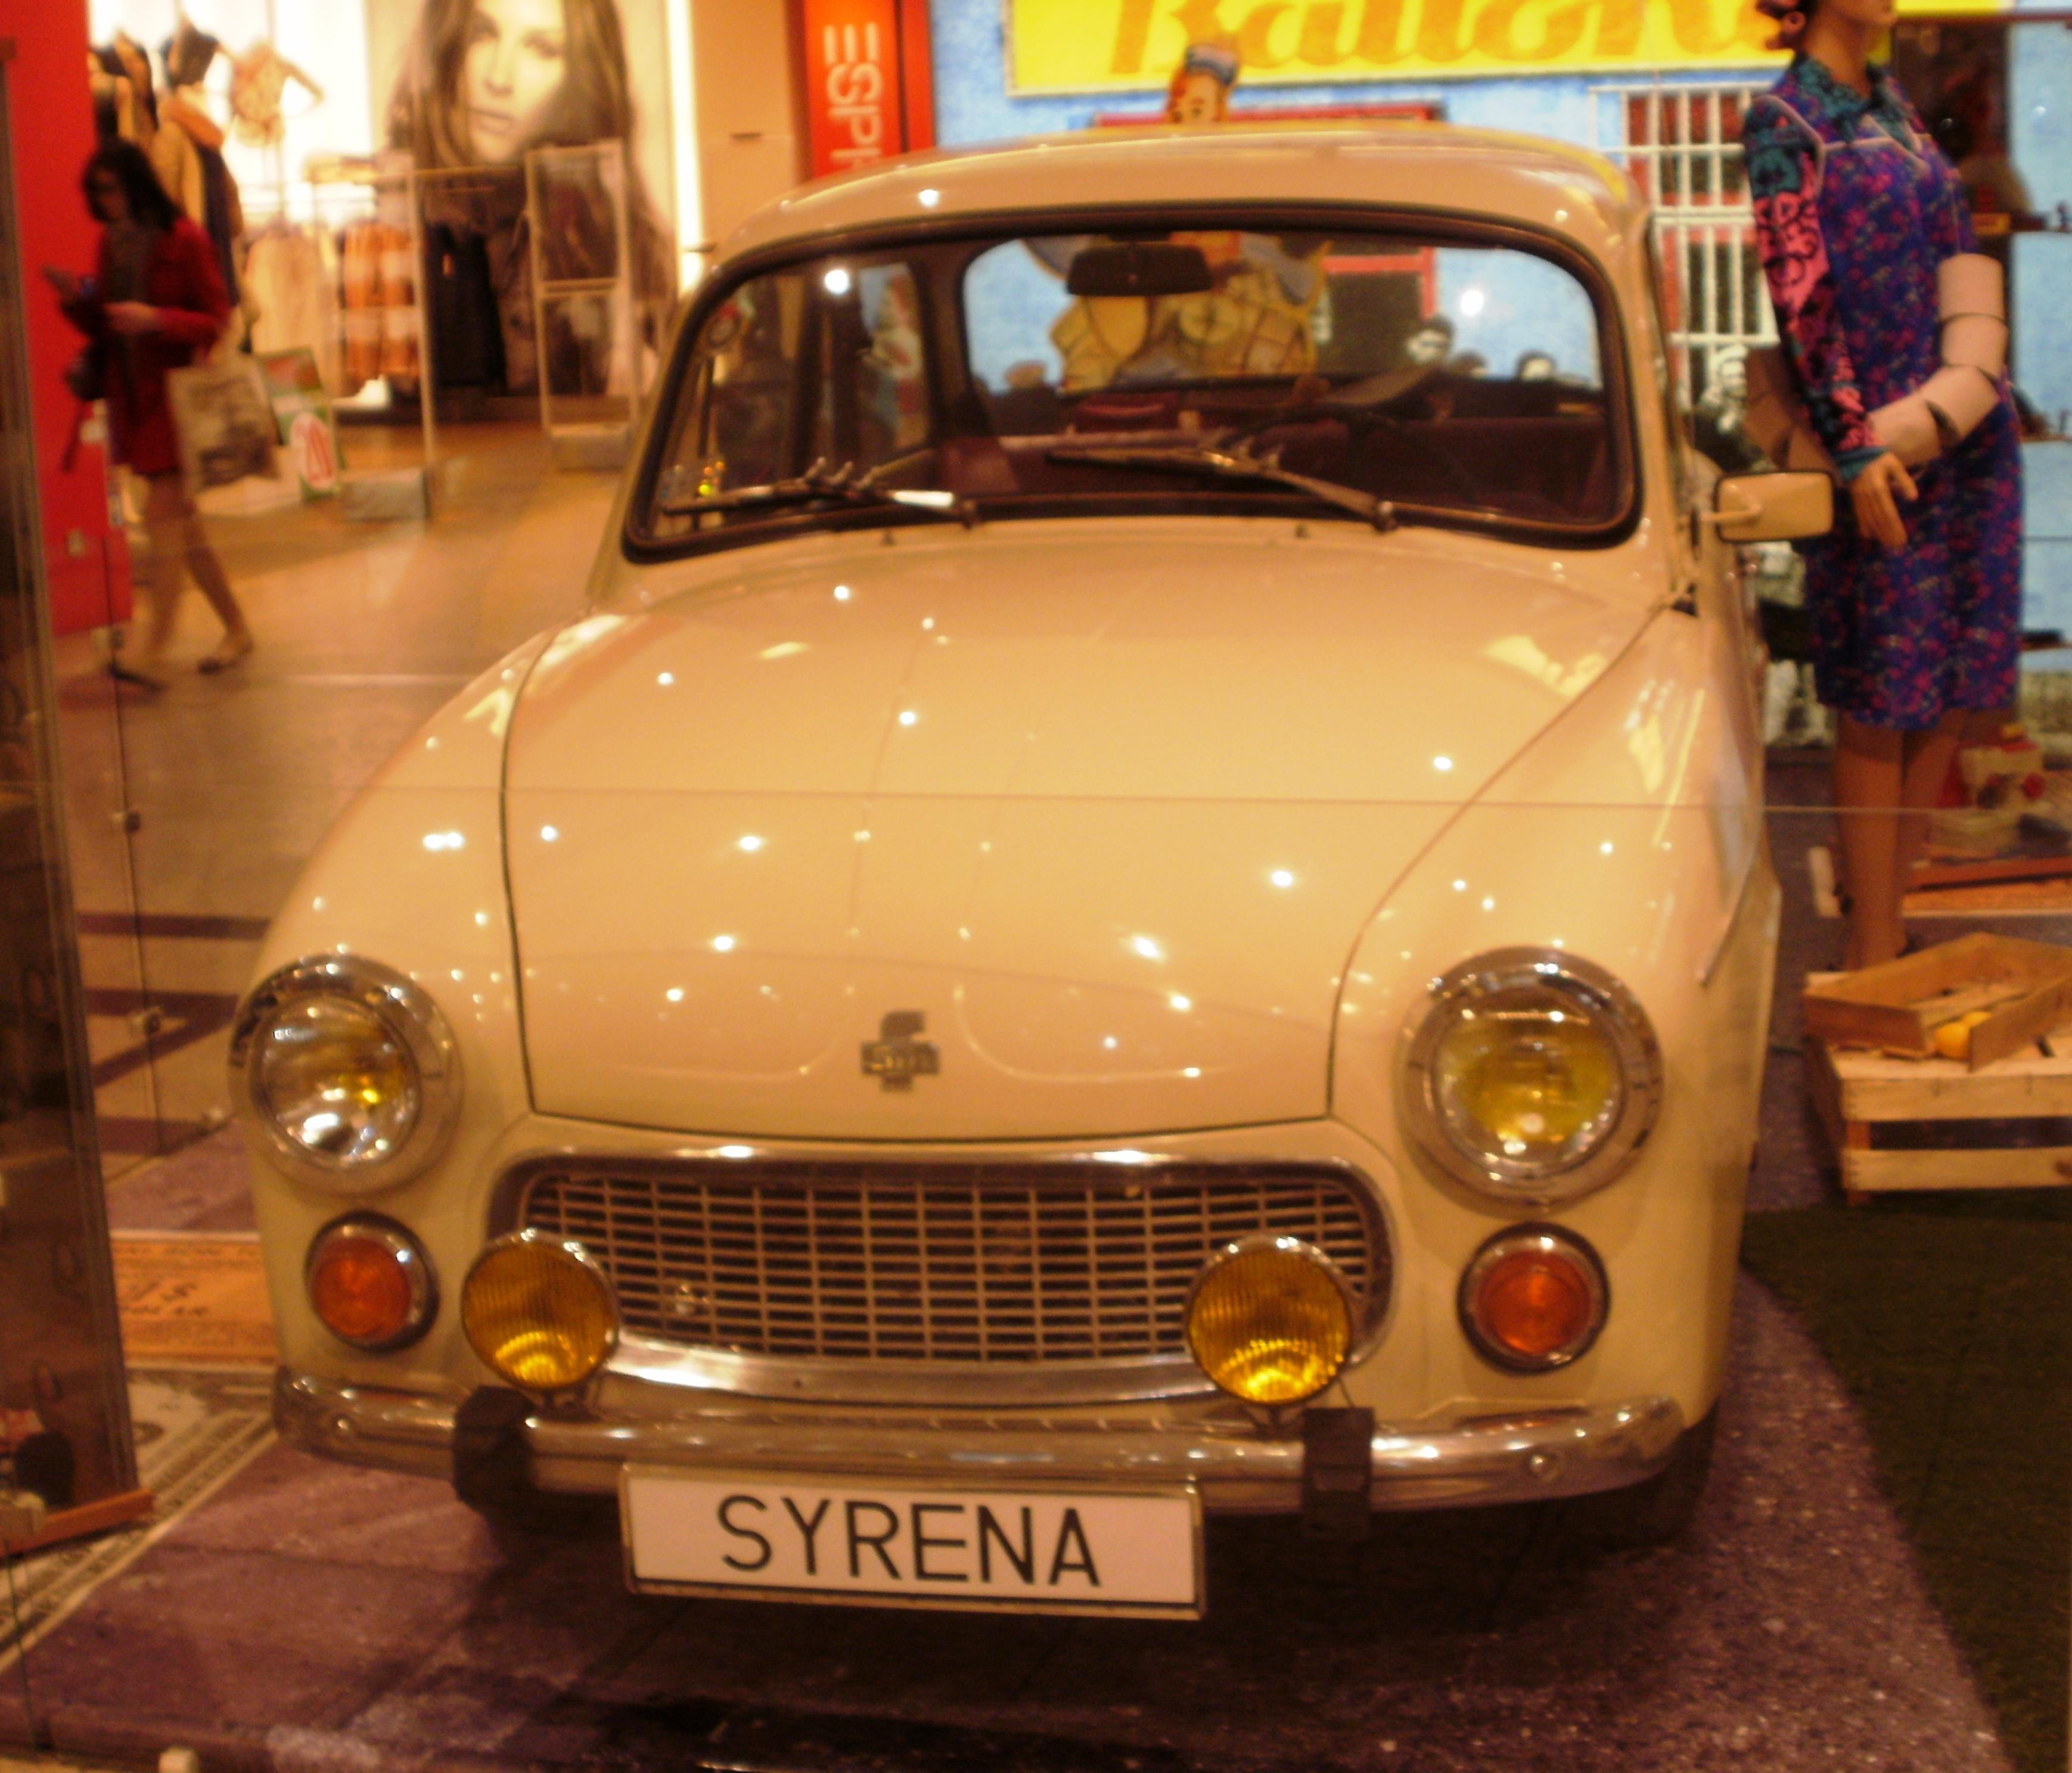 Galeria Krakowska: File:Syrena Galeria Krakowska 01.JPG